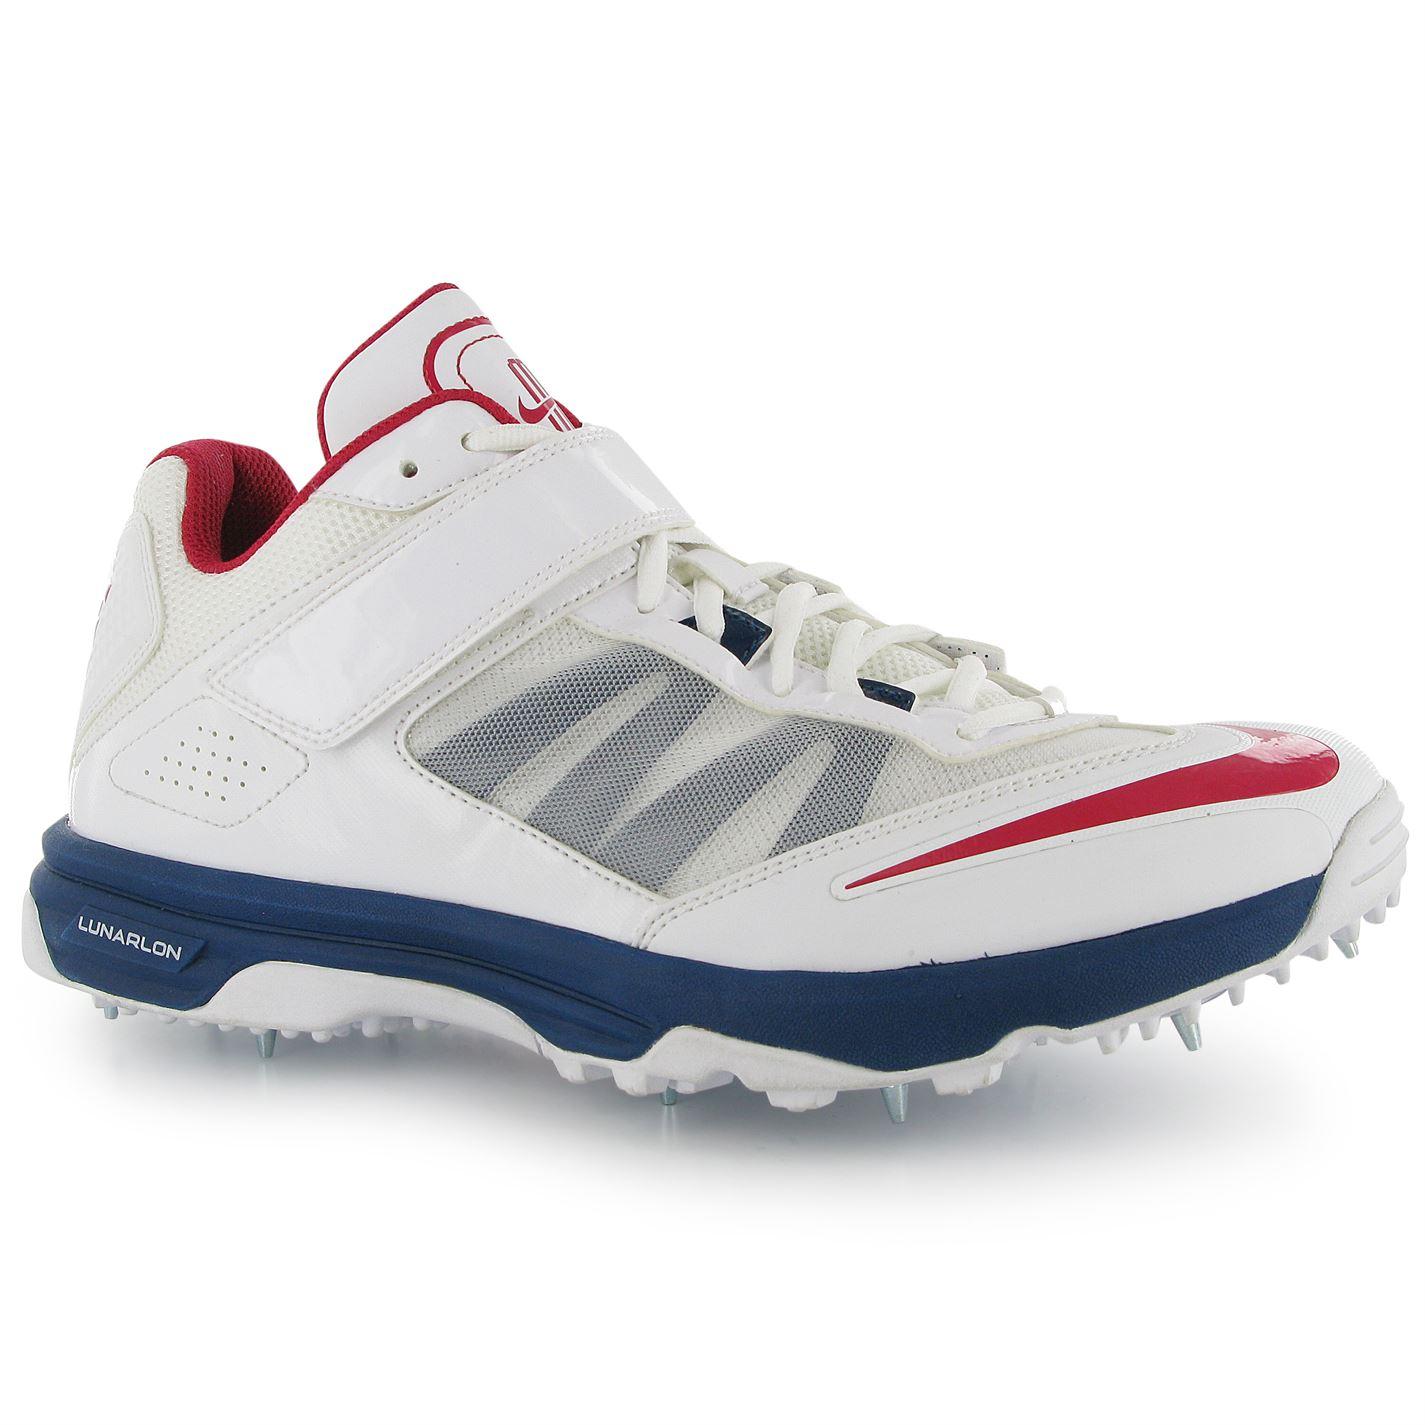 adidas cricket shoes dubai